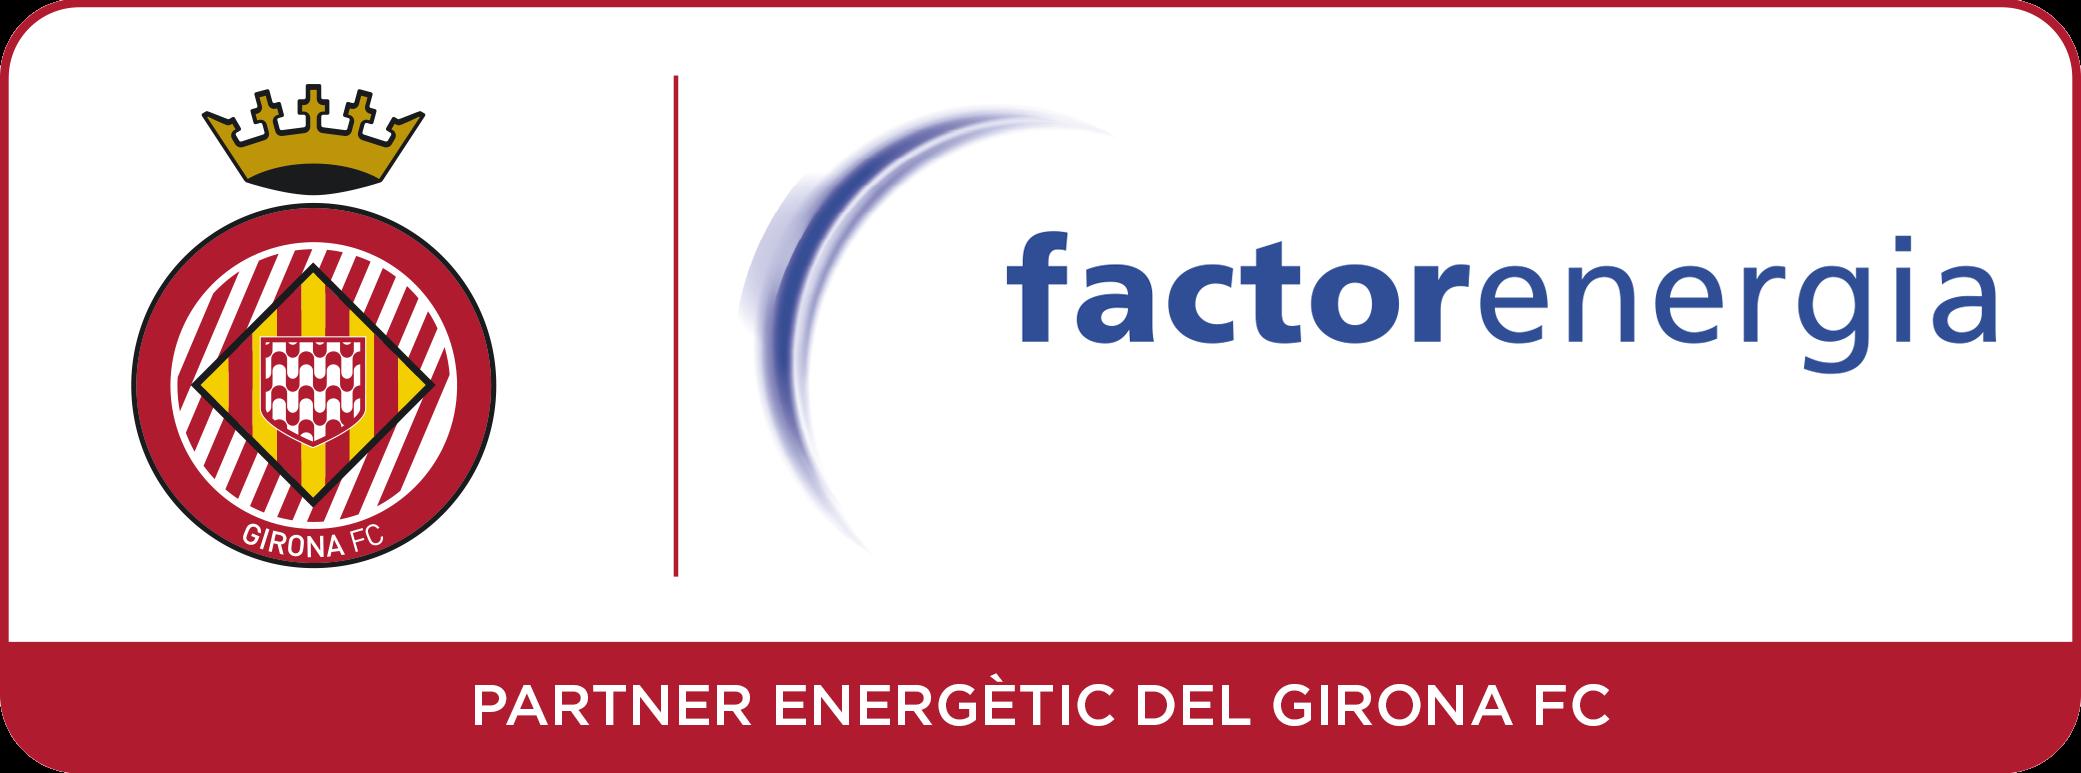 Factorenergia, partner energètic oficial del Girona FC